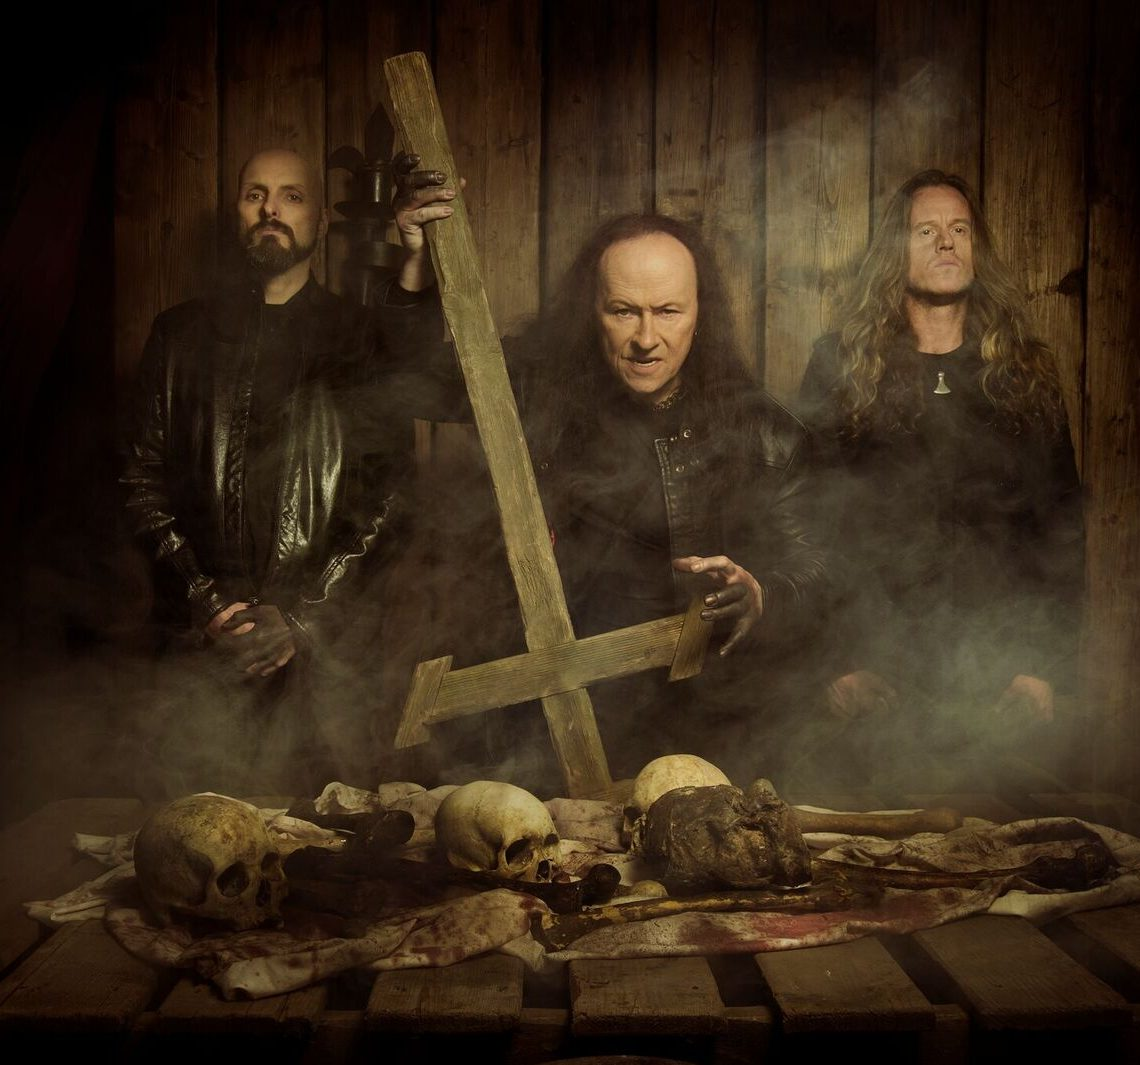 Venom announce 'In Nomine Satanas' – 40th Anniversary deluxe vinyl boxset released May 31st Via BMG Records